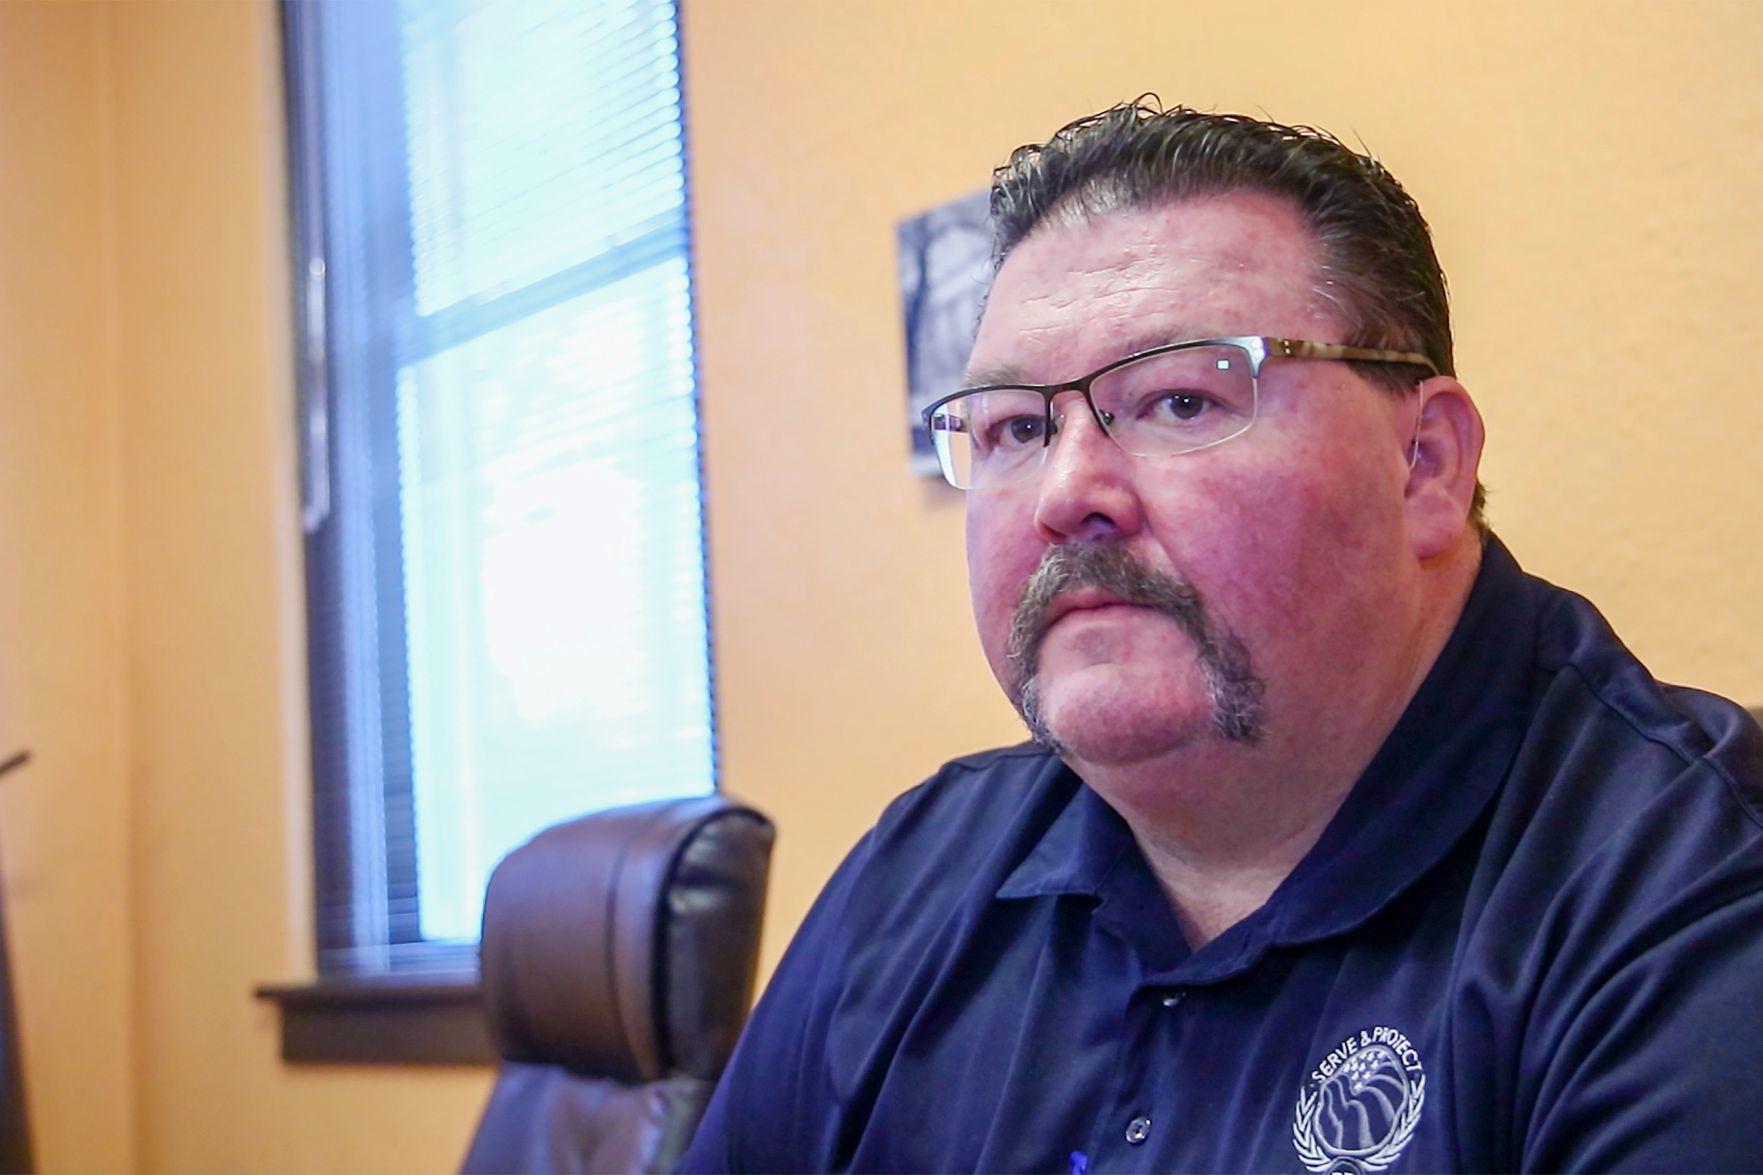 Calhoon retires as Boller steps in as Horton Police Chief